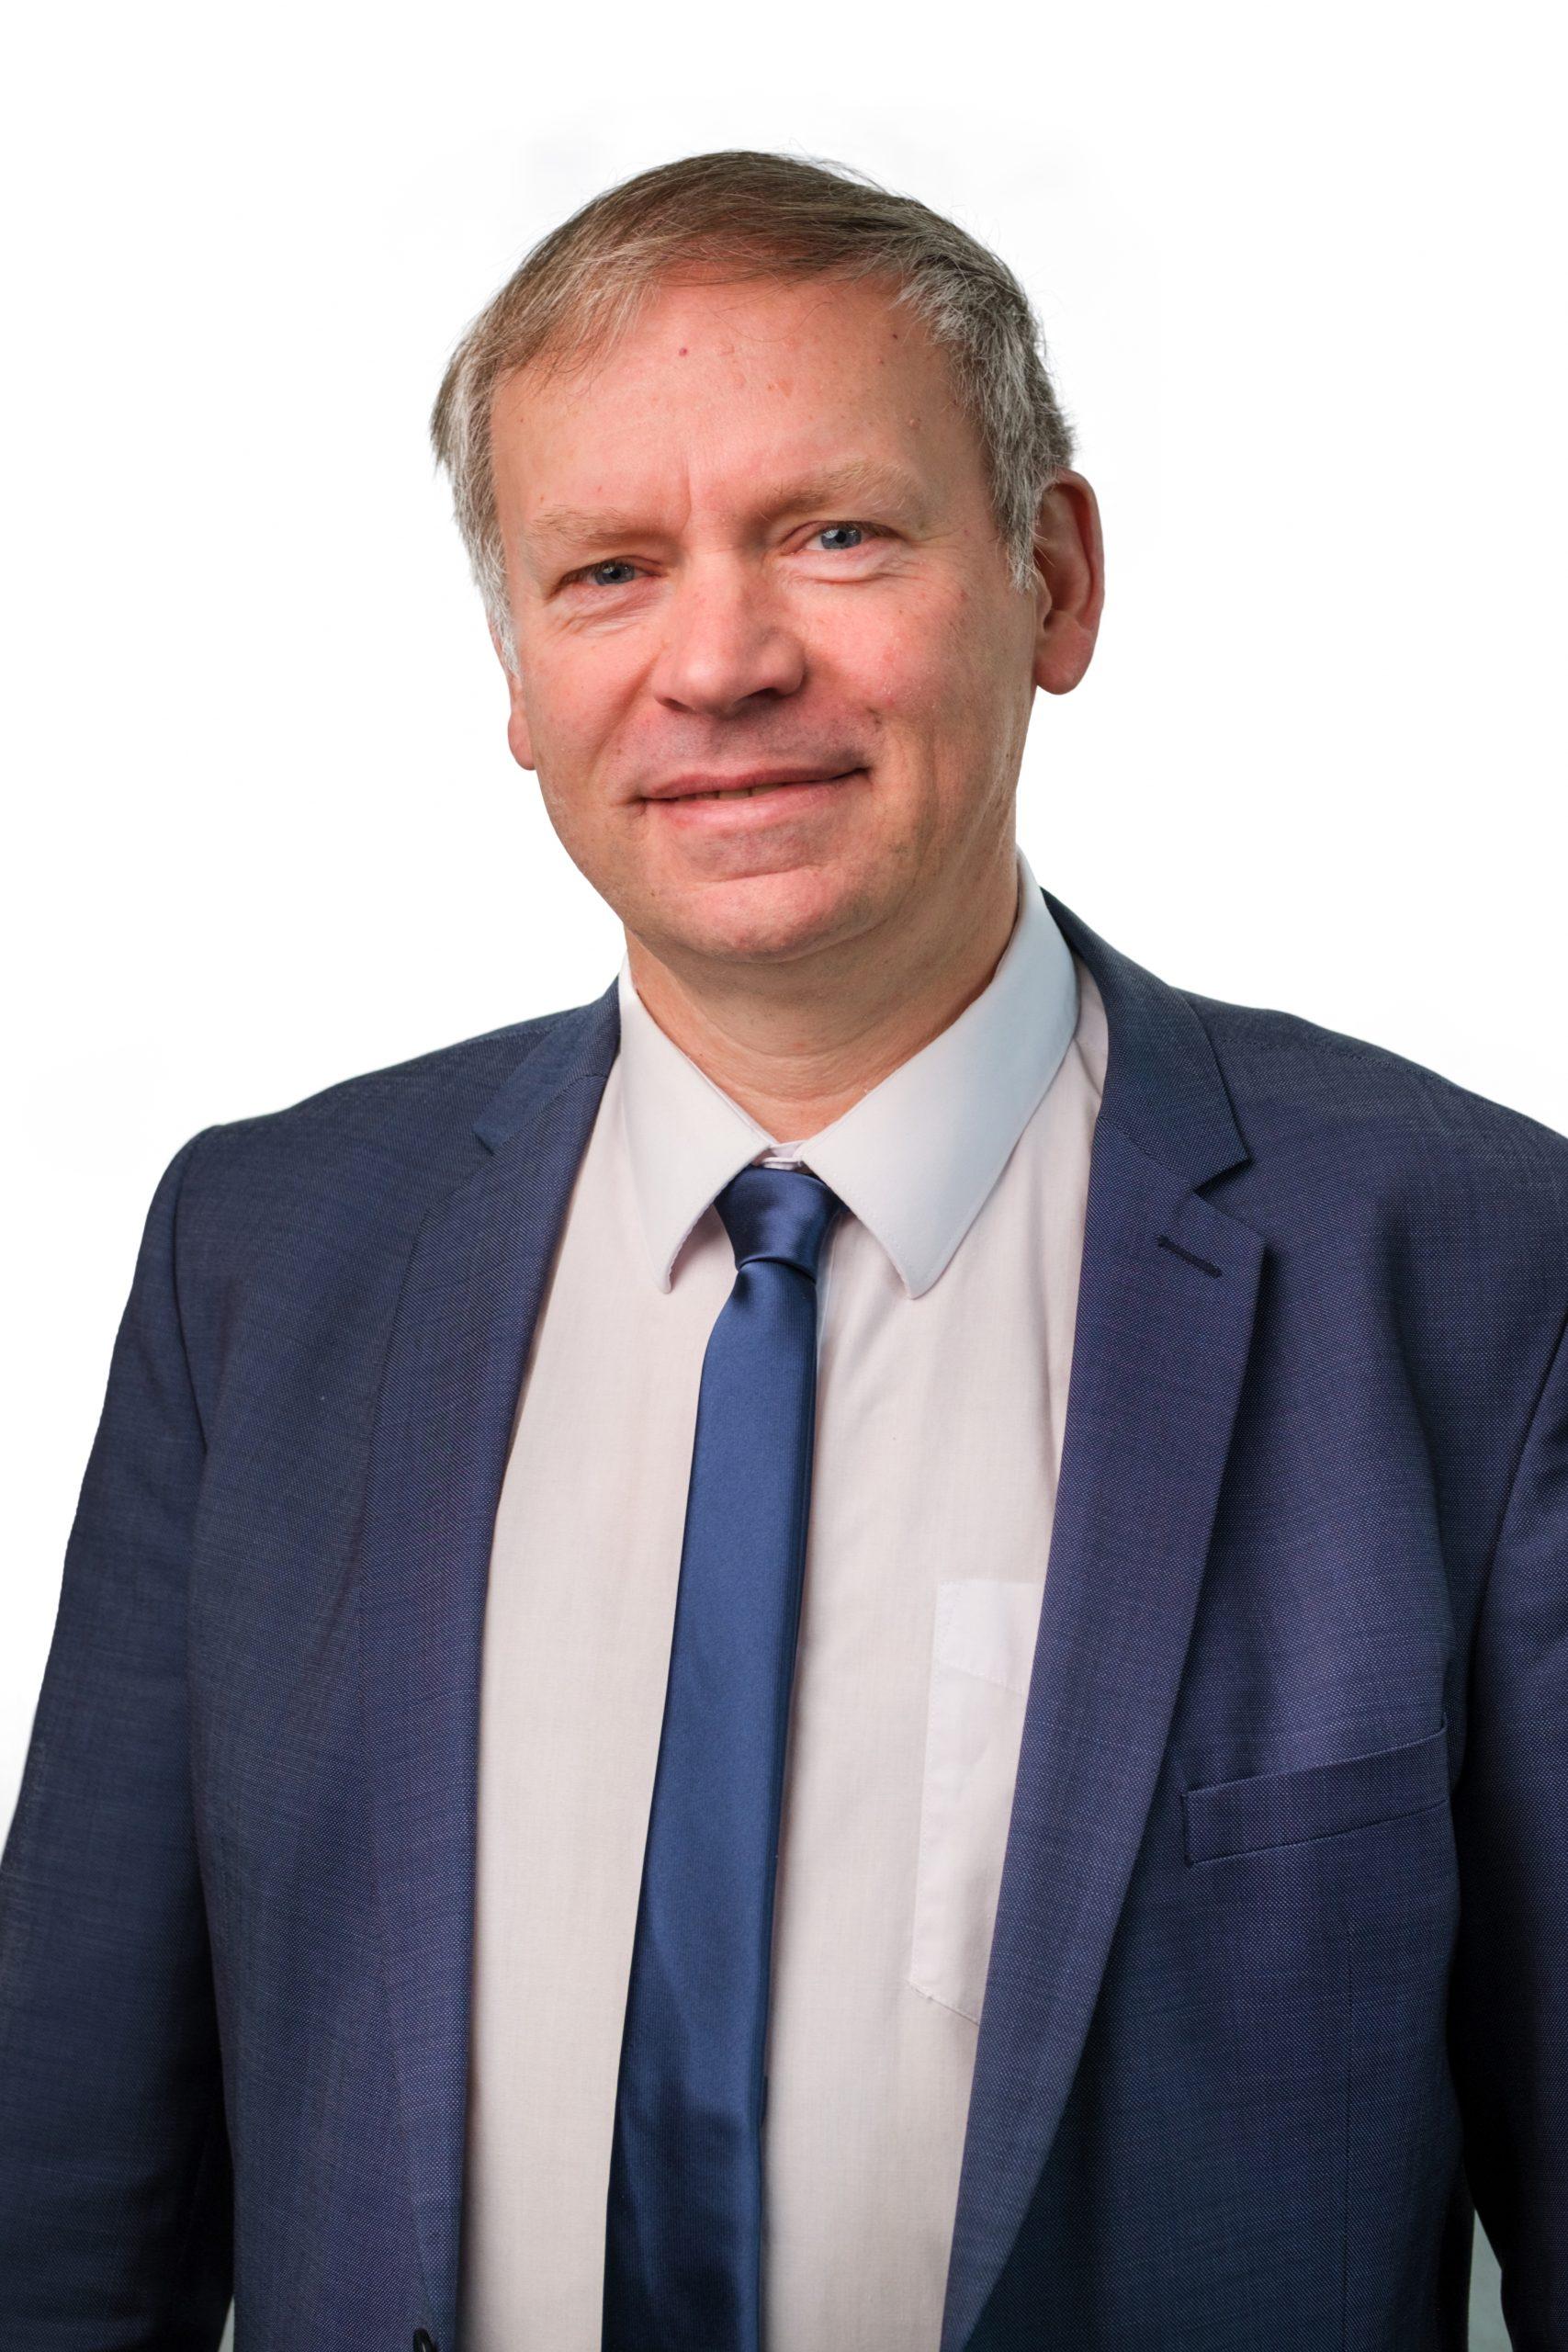 Anwalt Dieter Feltrup